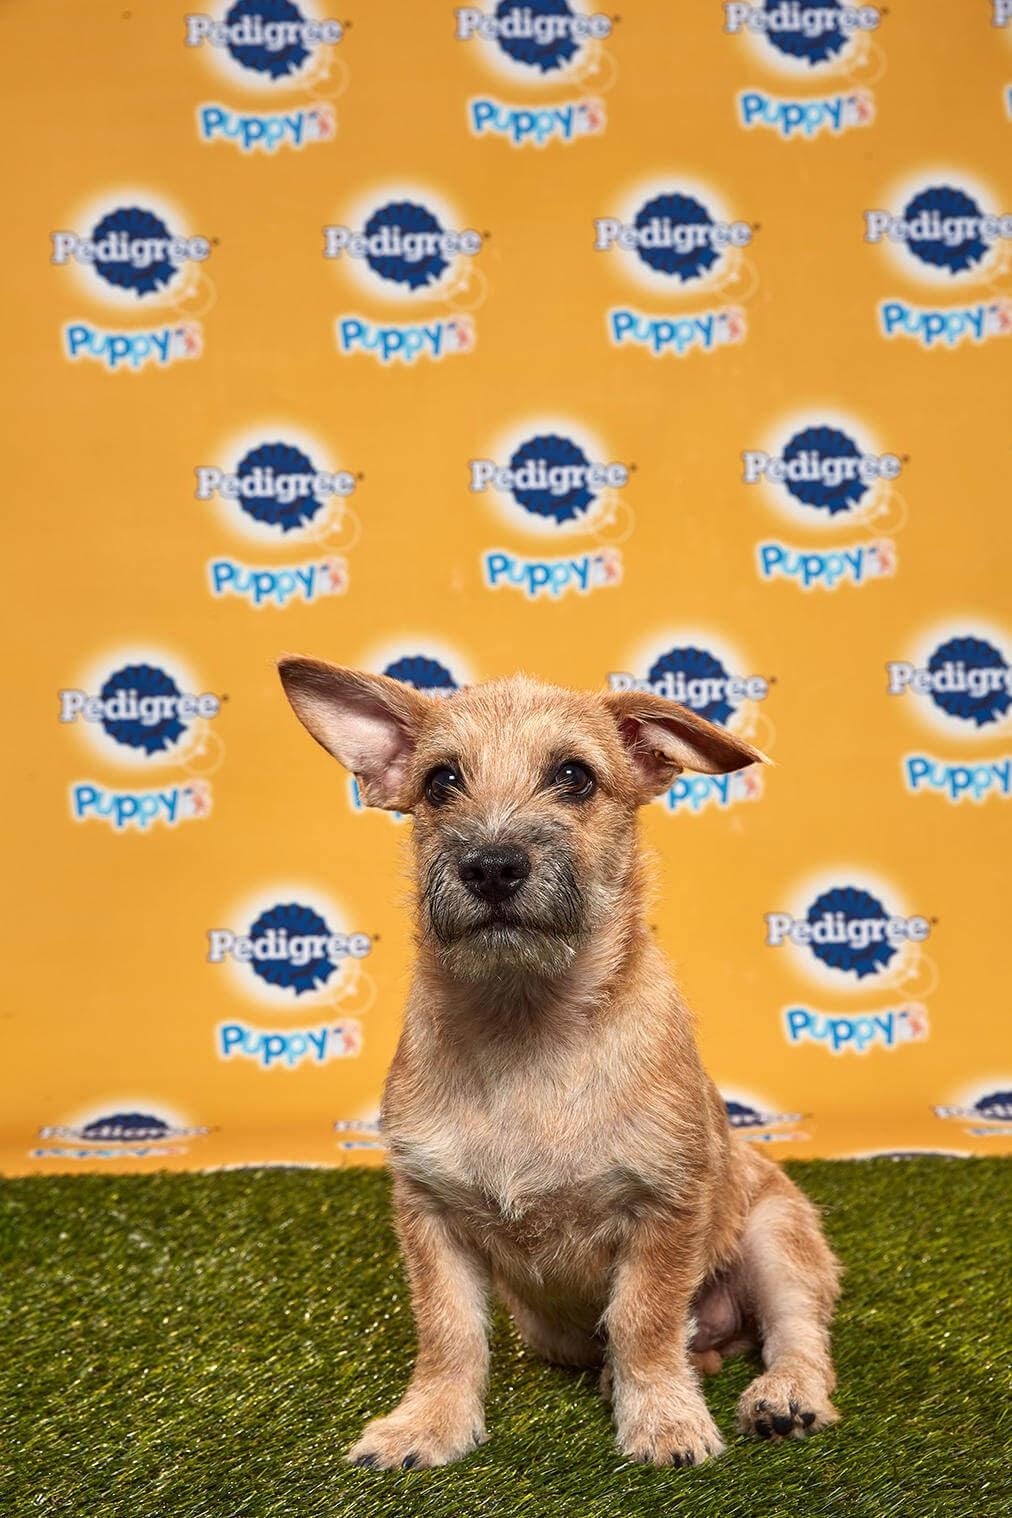 Rummy Dog - Animal Planet